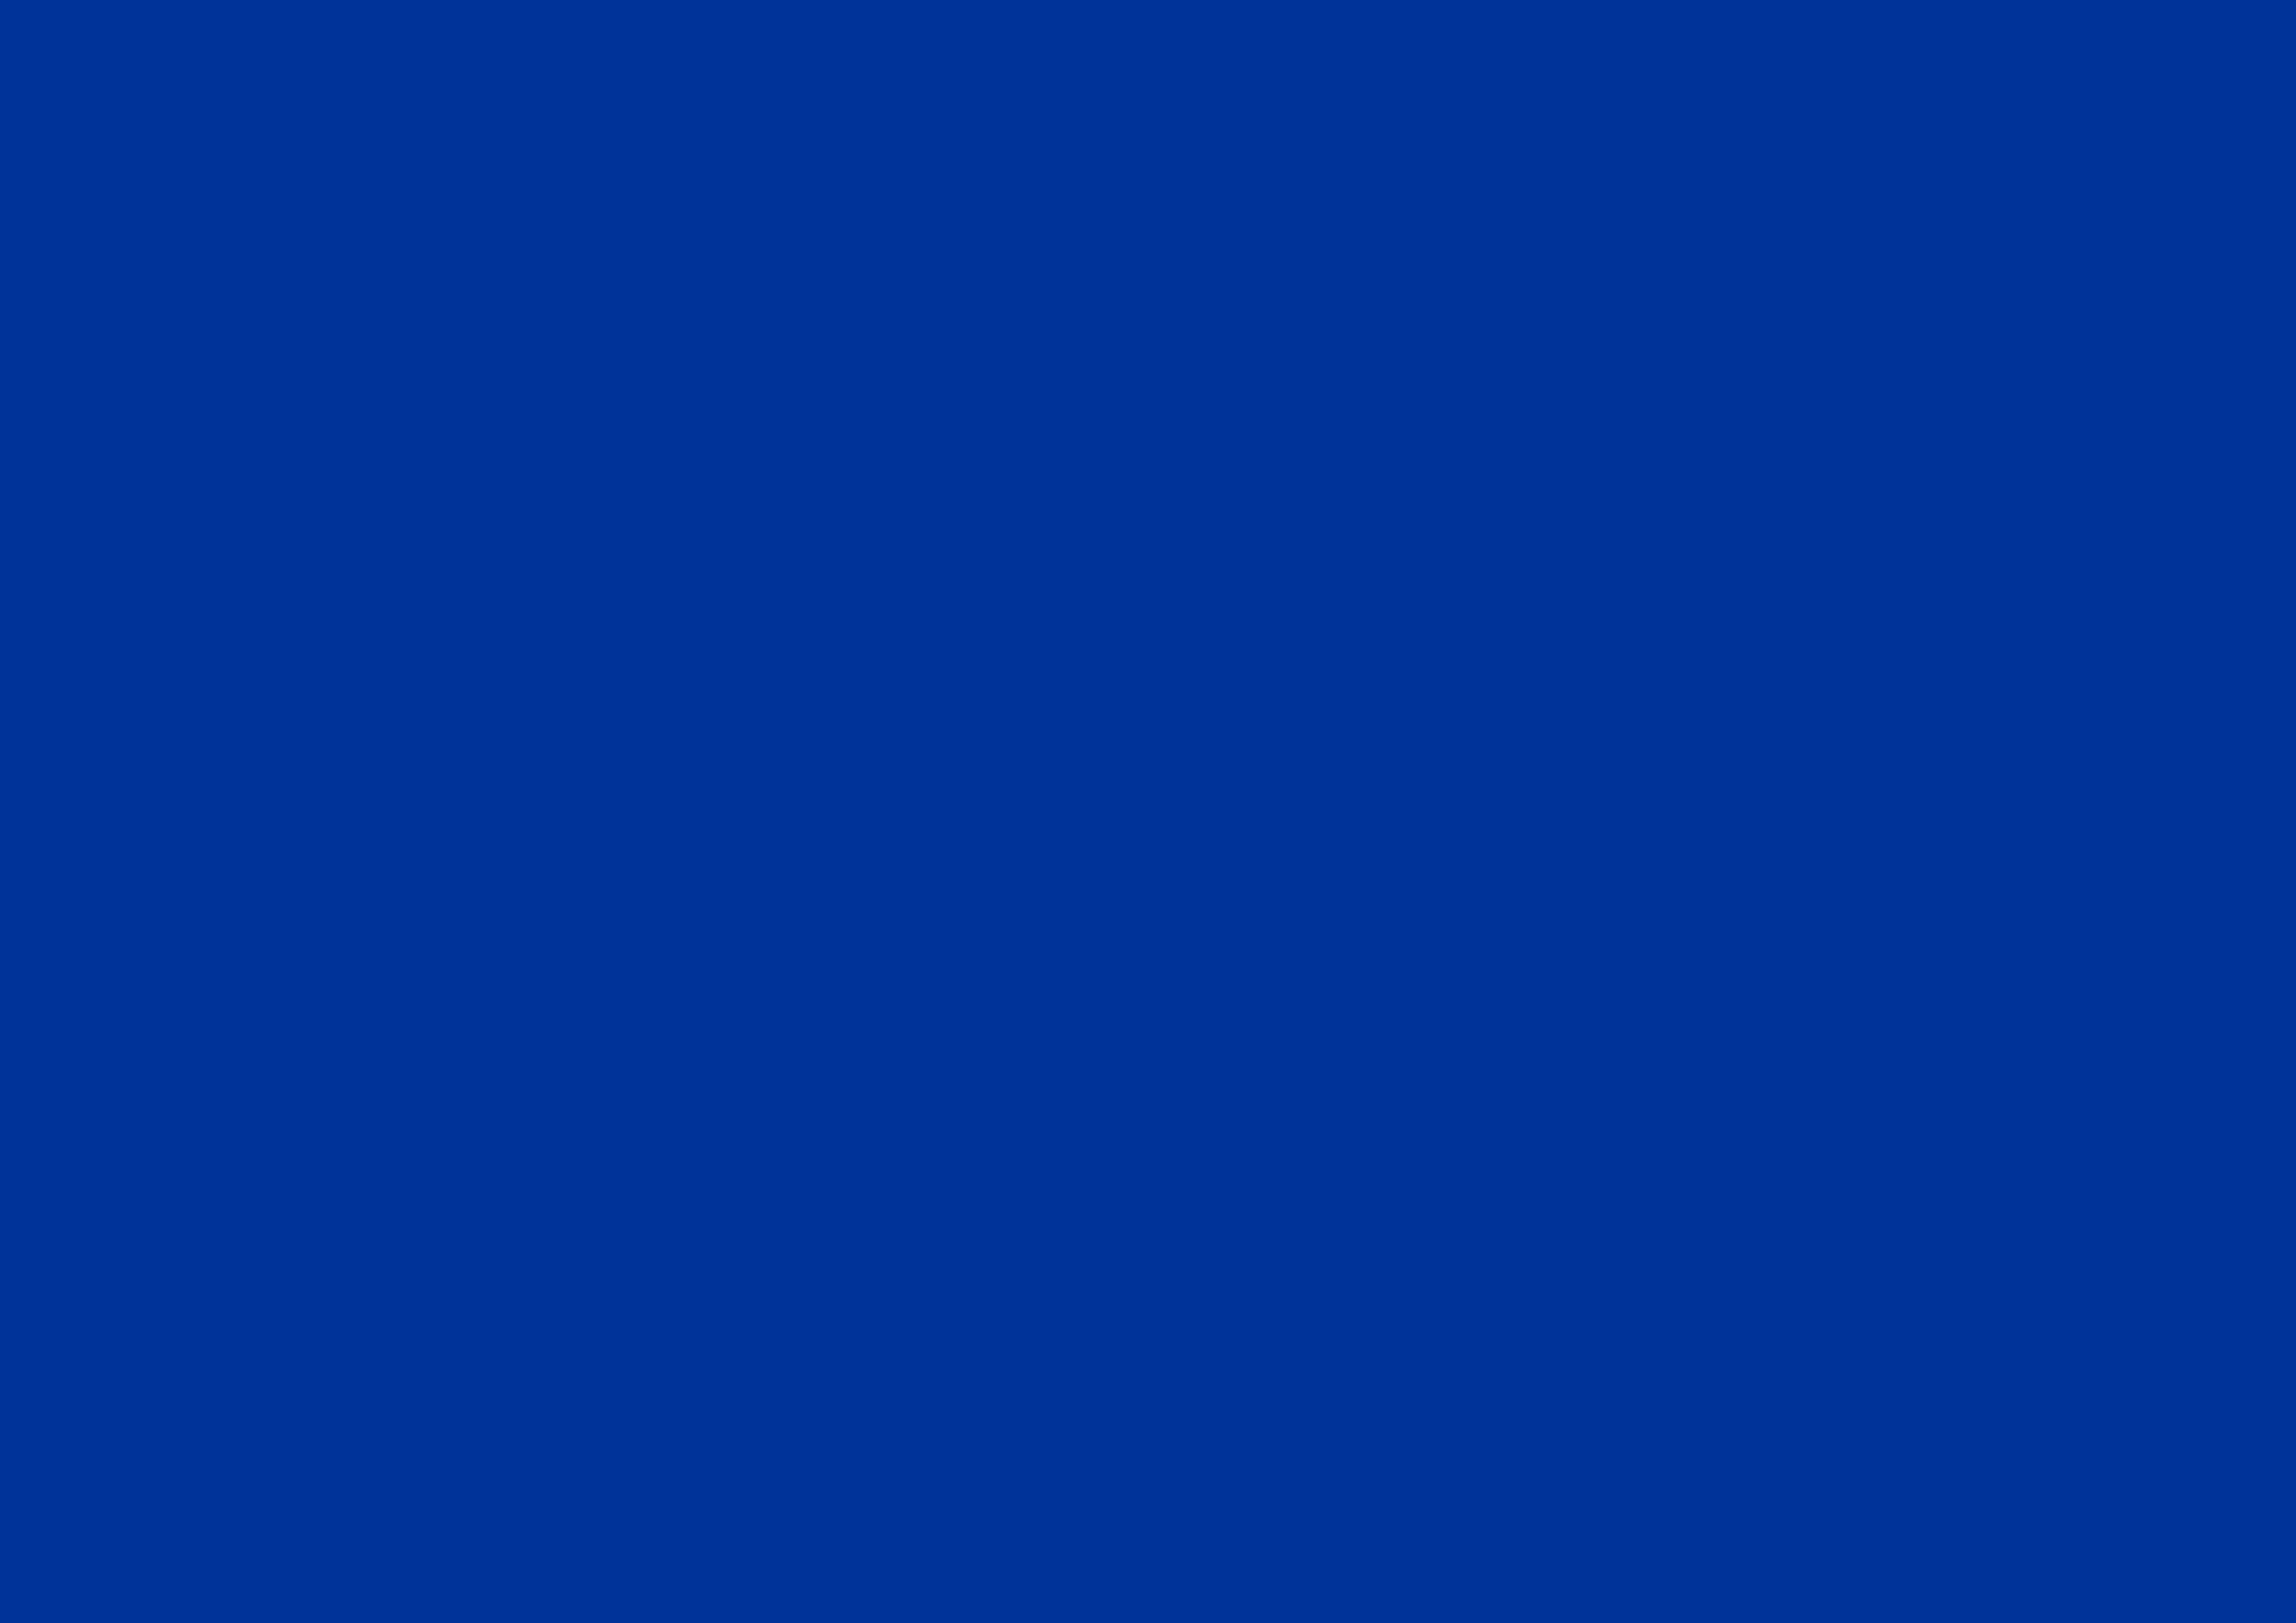 3508x2480 Smalt Dark Powder Blue Solid Color Background